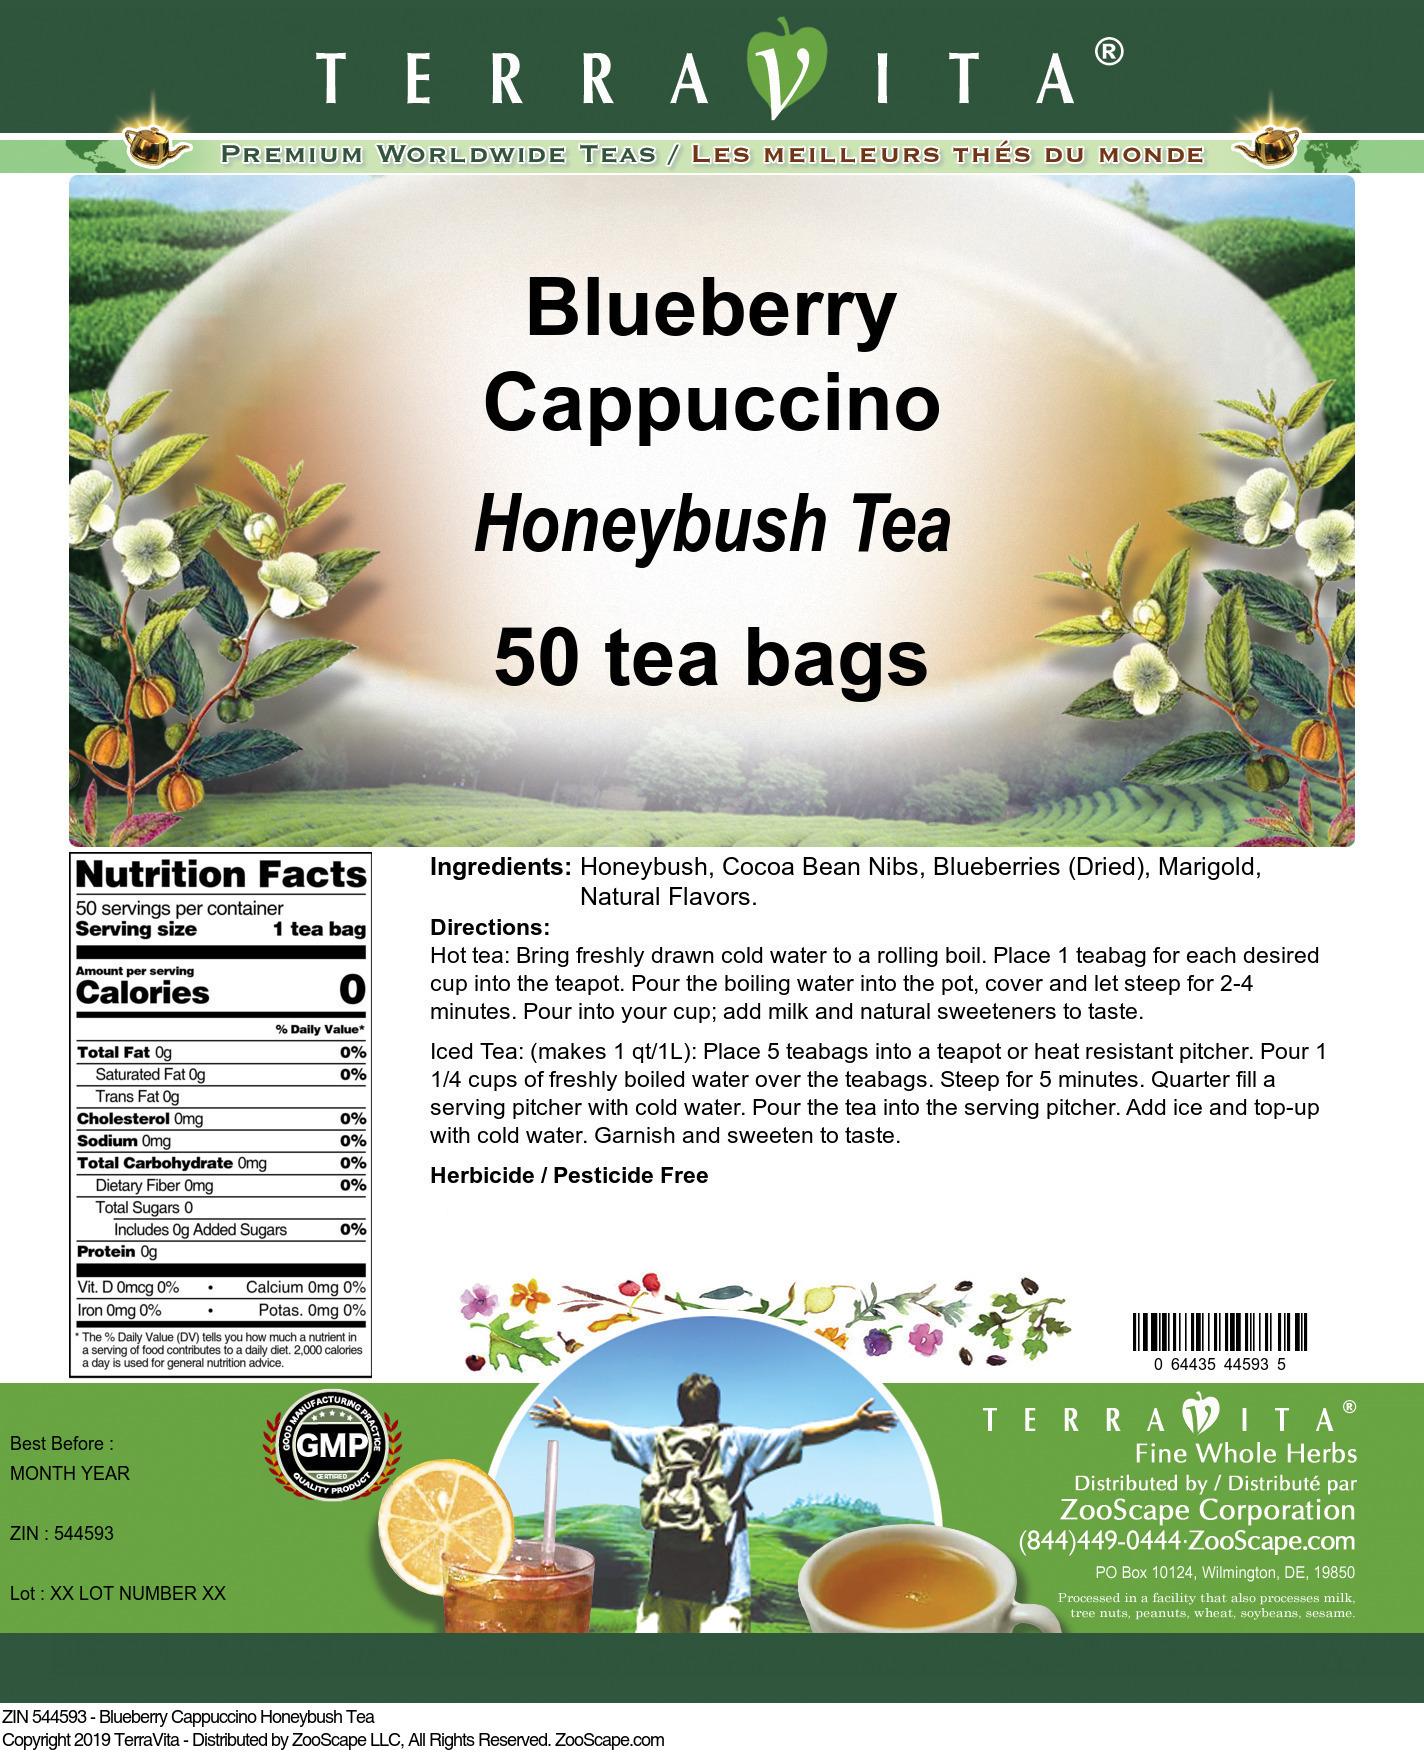 Blueberry Cappuccino Honeybush Tea